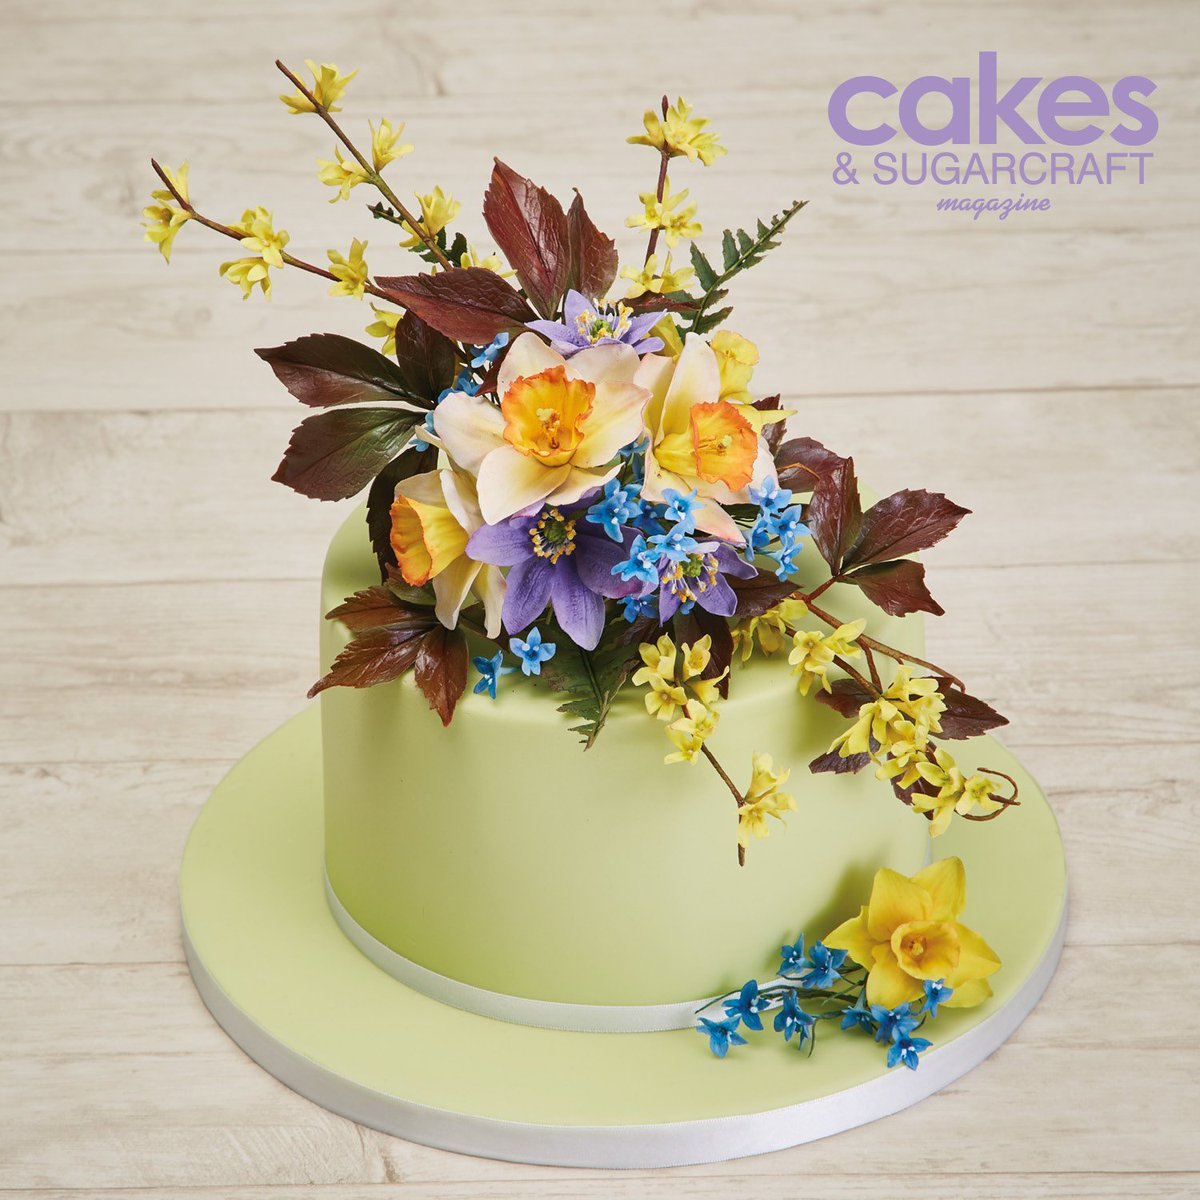 Cakes & Sugarcraft on Twitter: \